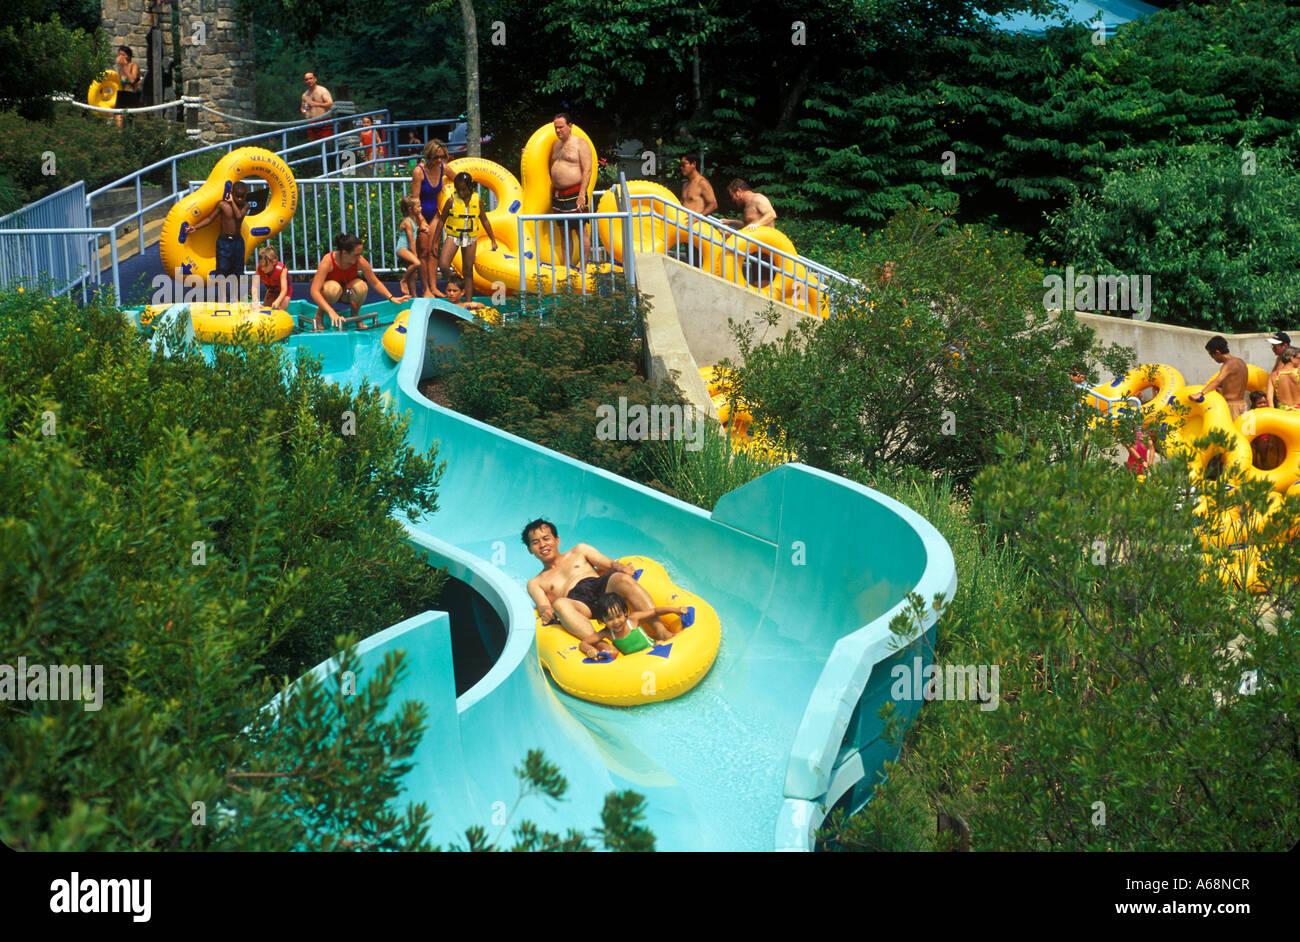 Water Slide, Water Country, Busch Gardens, Willimsburg, Virginia Pictures Gallery